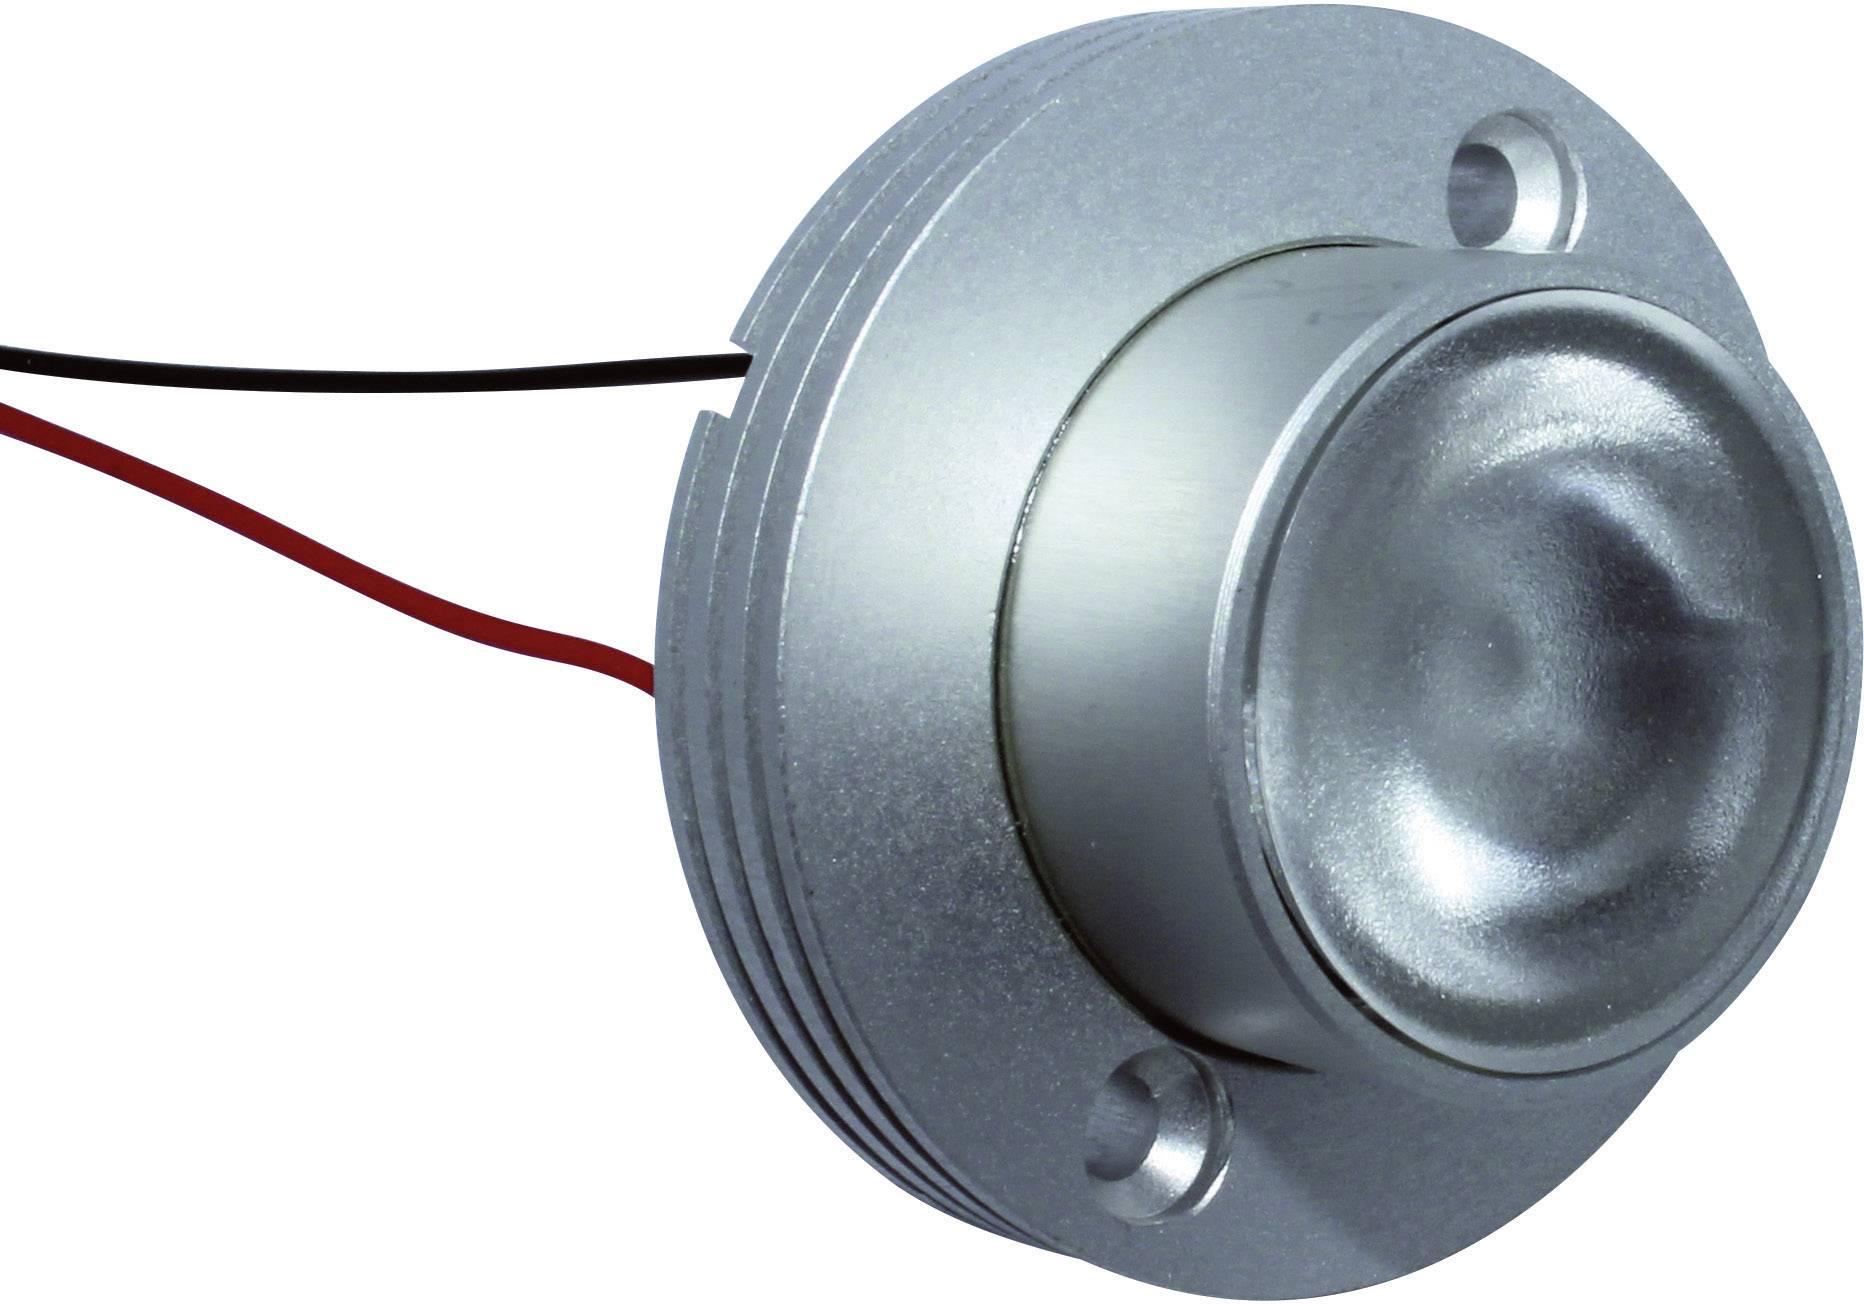 HighPower LED-spot Signal Construct QAUR1501L030, 45 °, 70 lm, 1 W, 2.3 V, červená